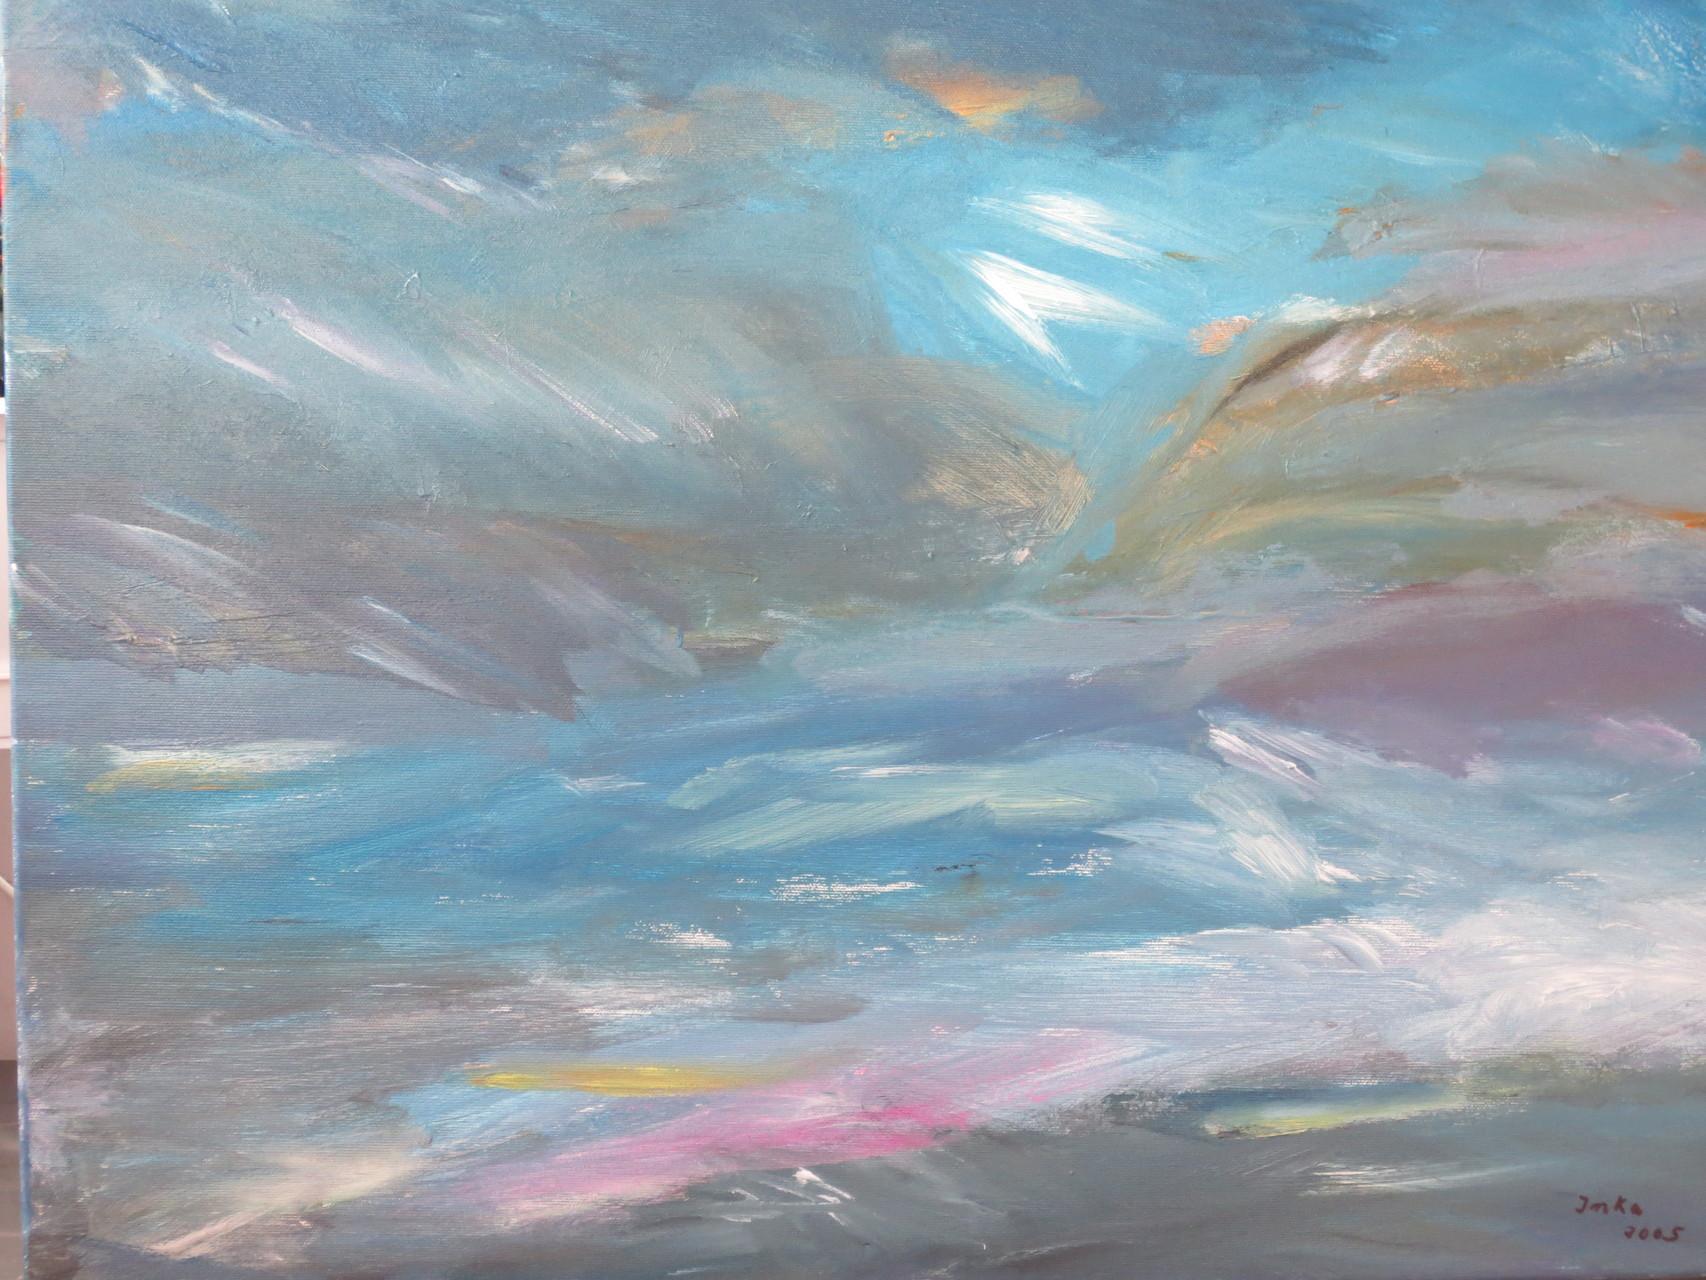 blue impression (50 x 70)